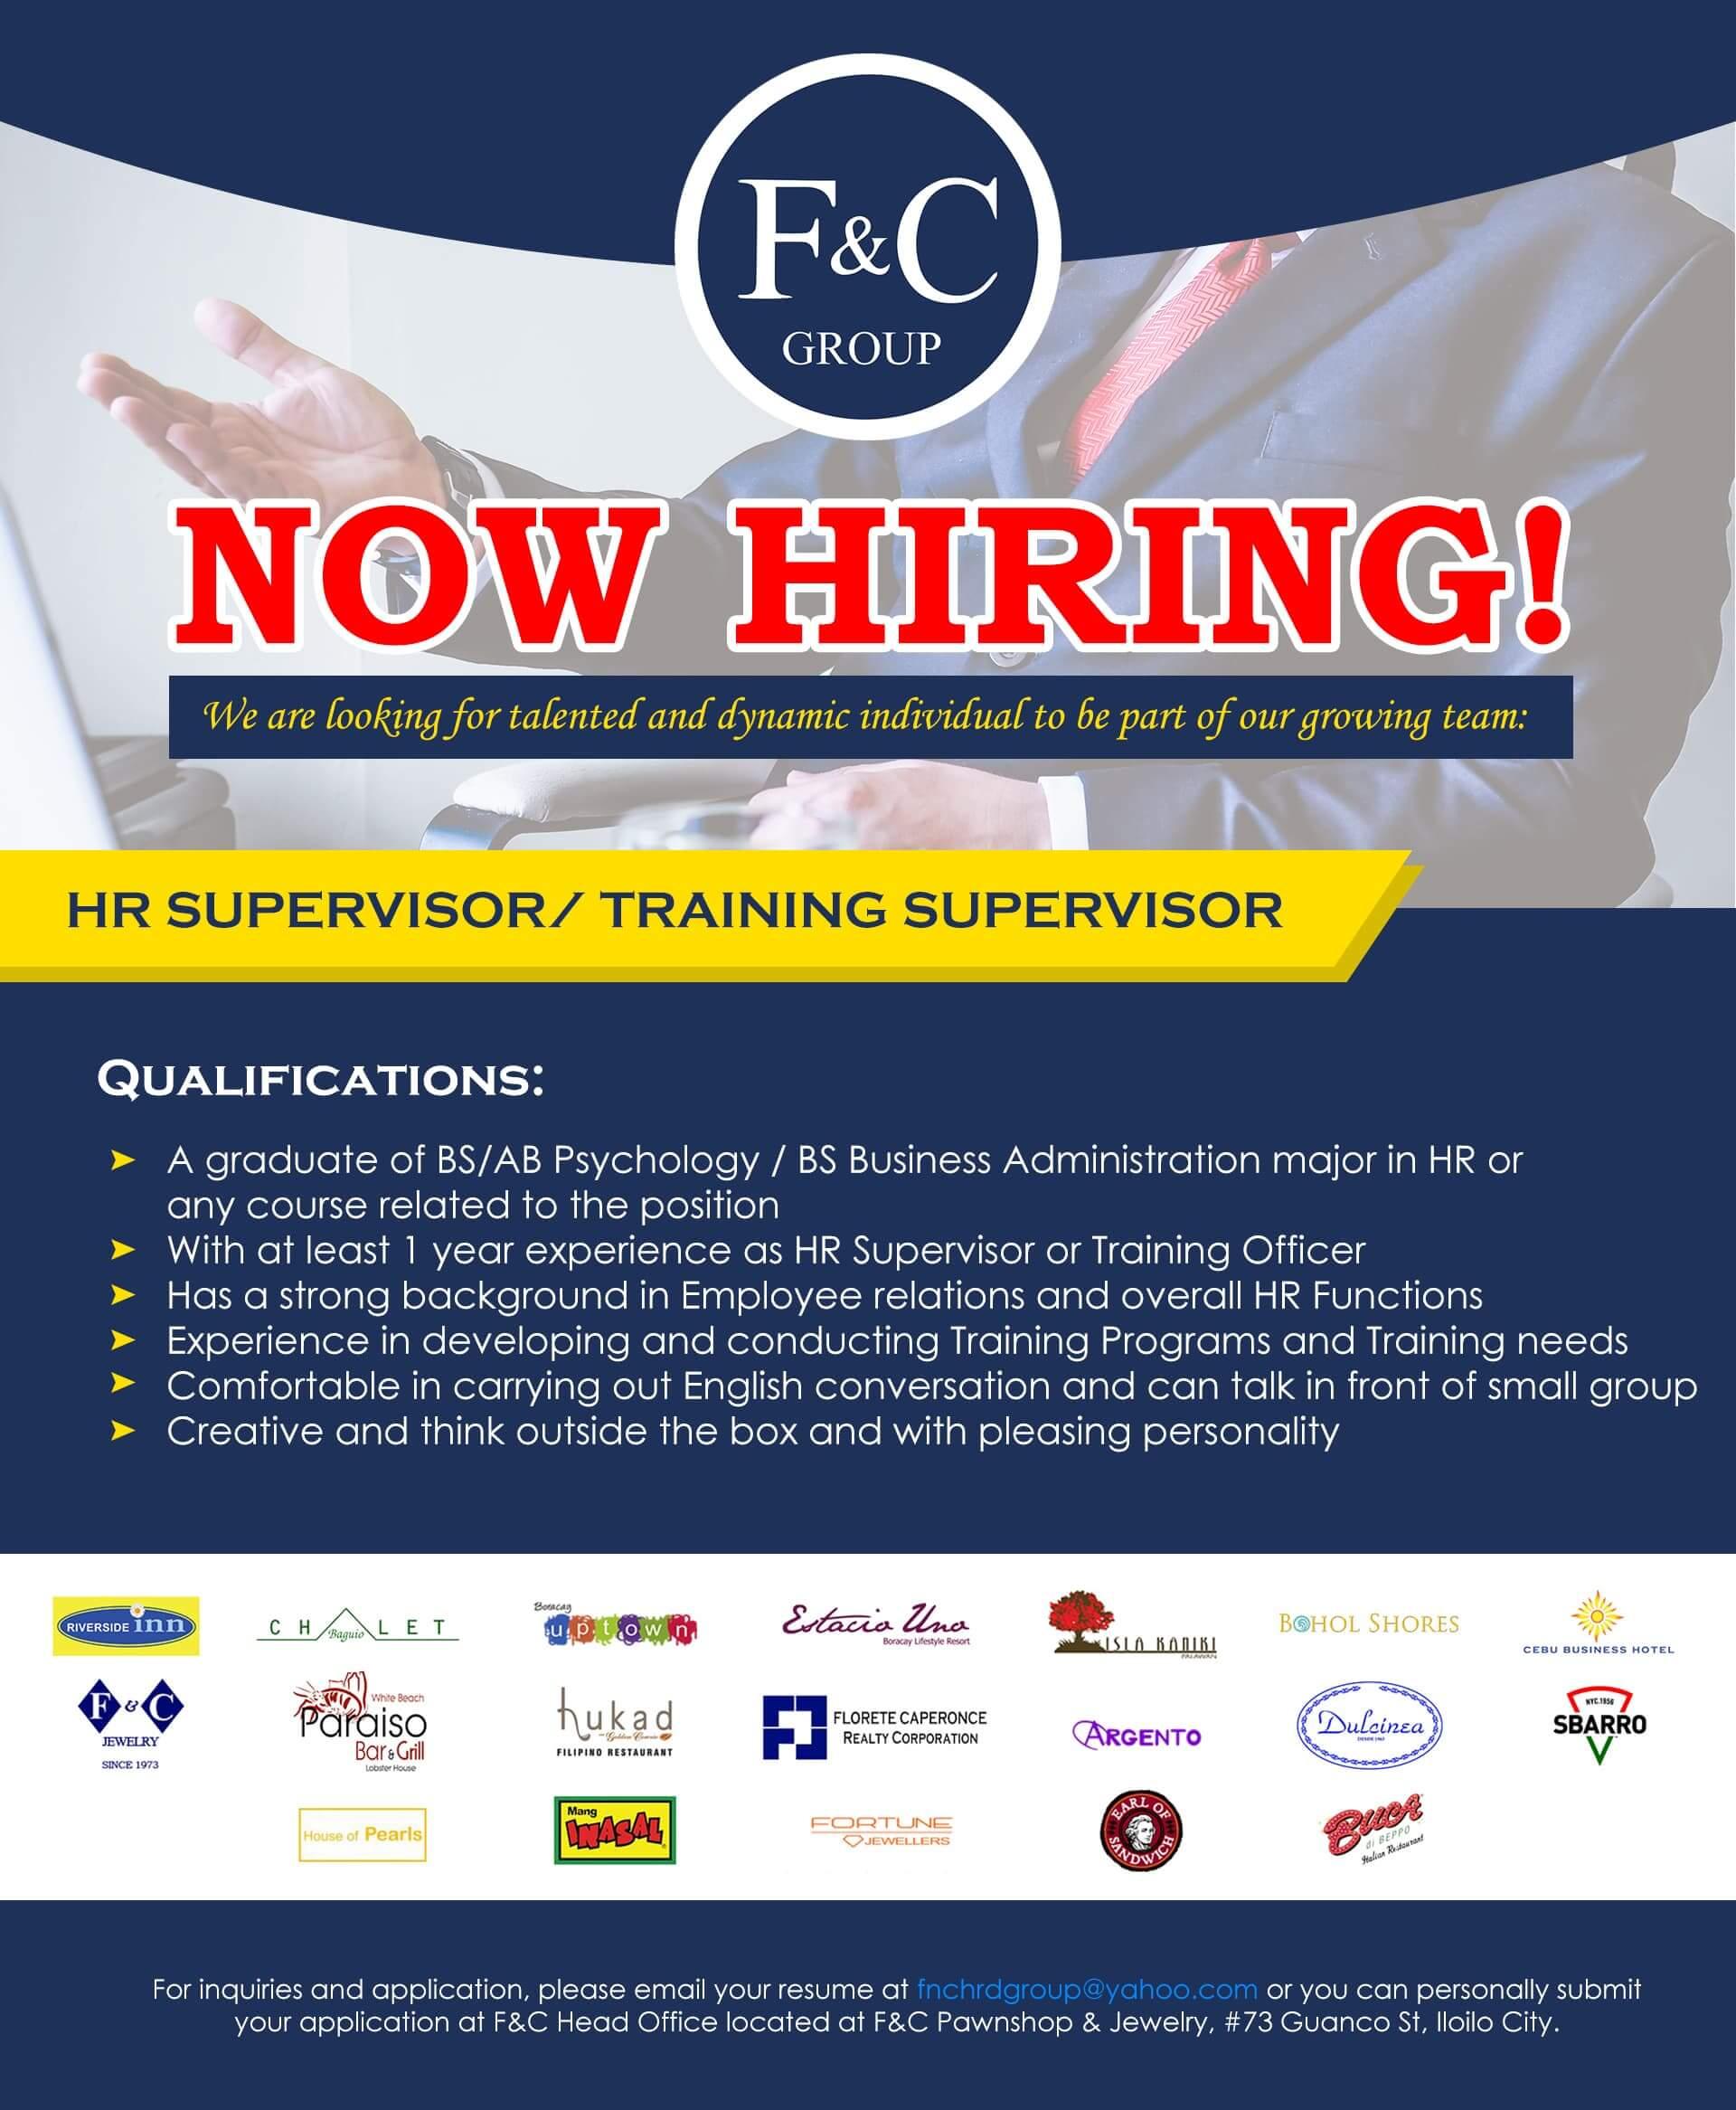 fncgroup-careers-hr-supervisor